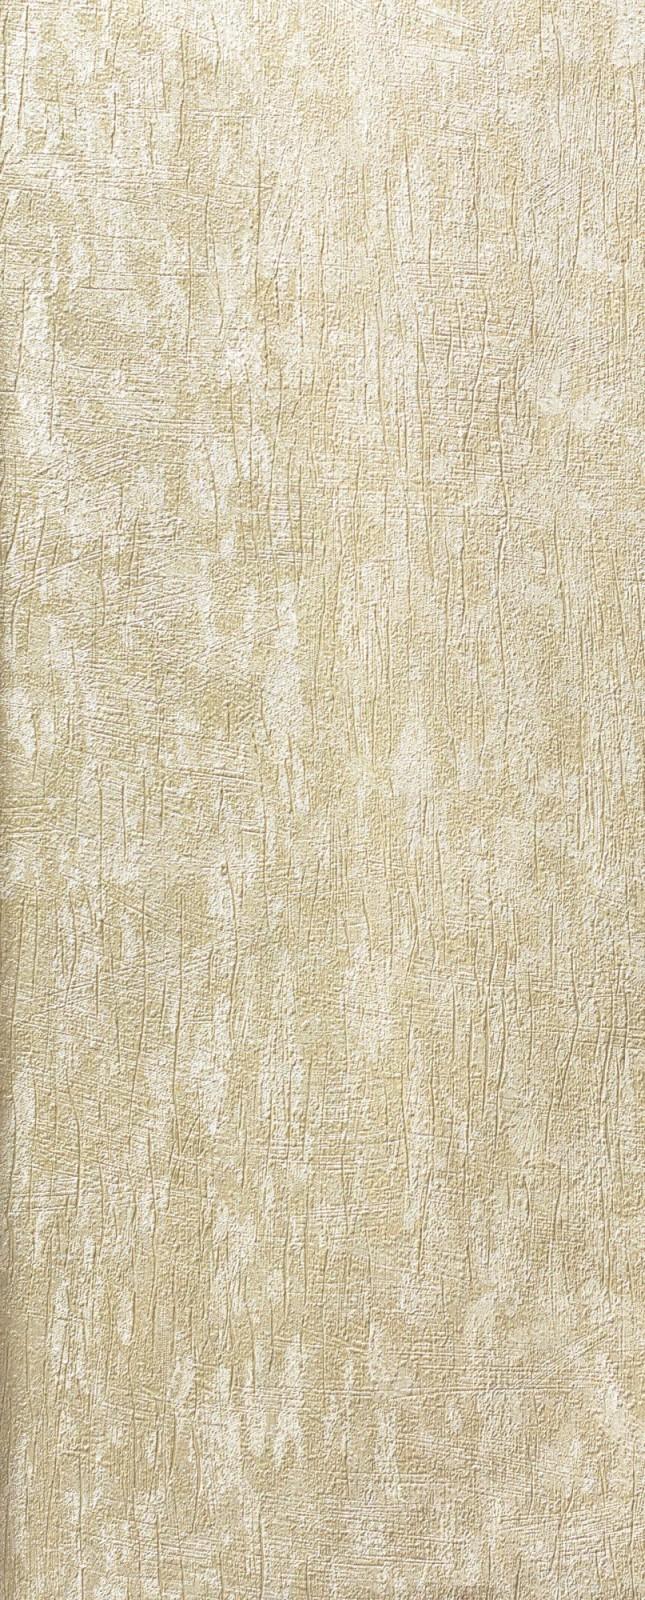 Marburg Tapeten Opulence : Marburg Vliestapete OPULENCE Tapete 77855 beige meliert